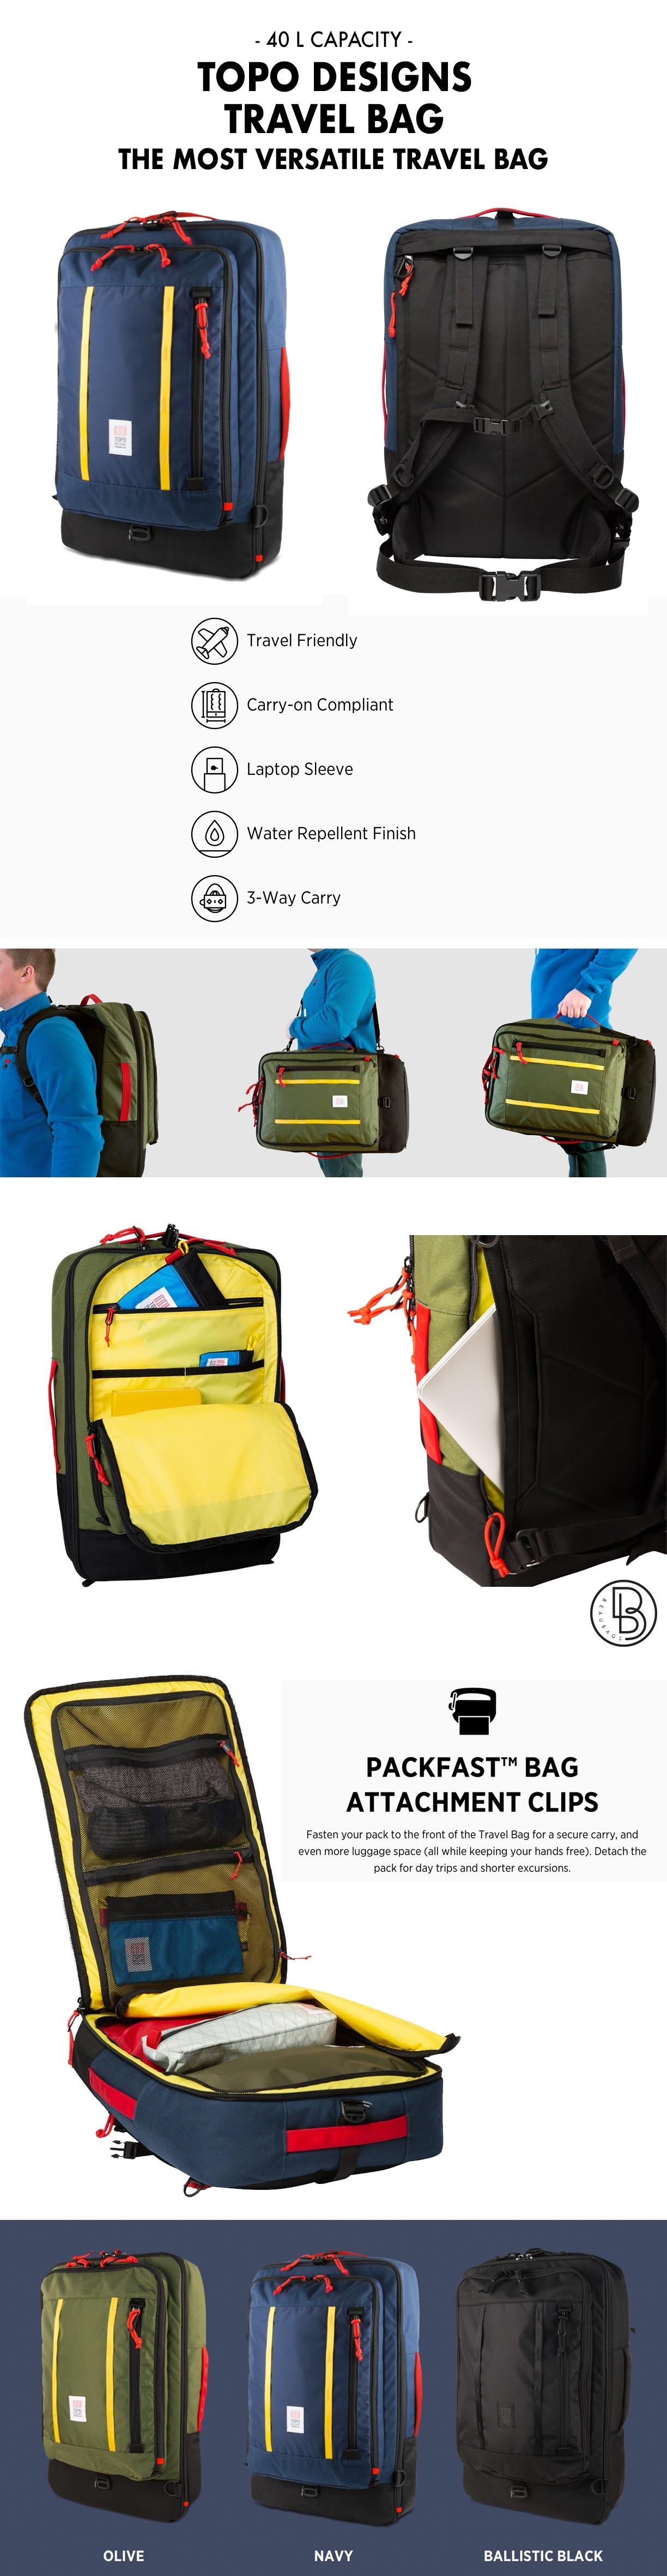 Topo Designs Travel Bag 40L product information